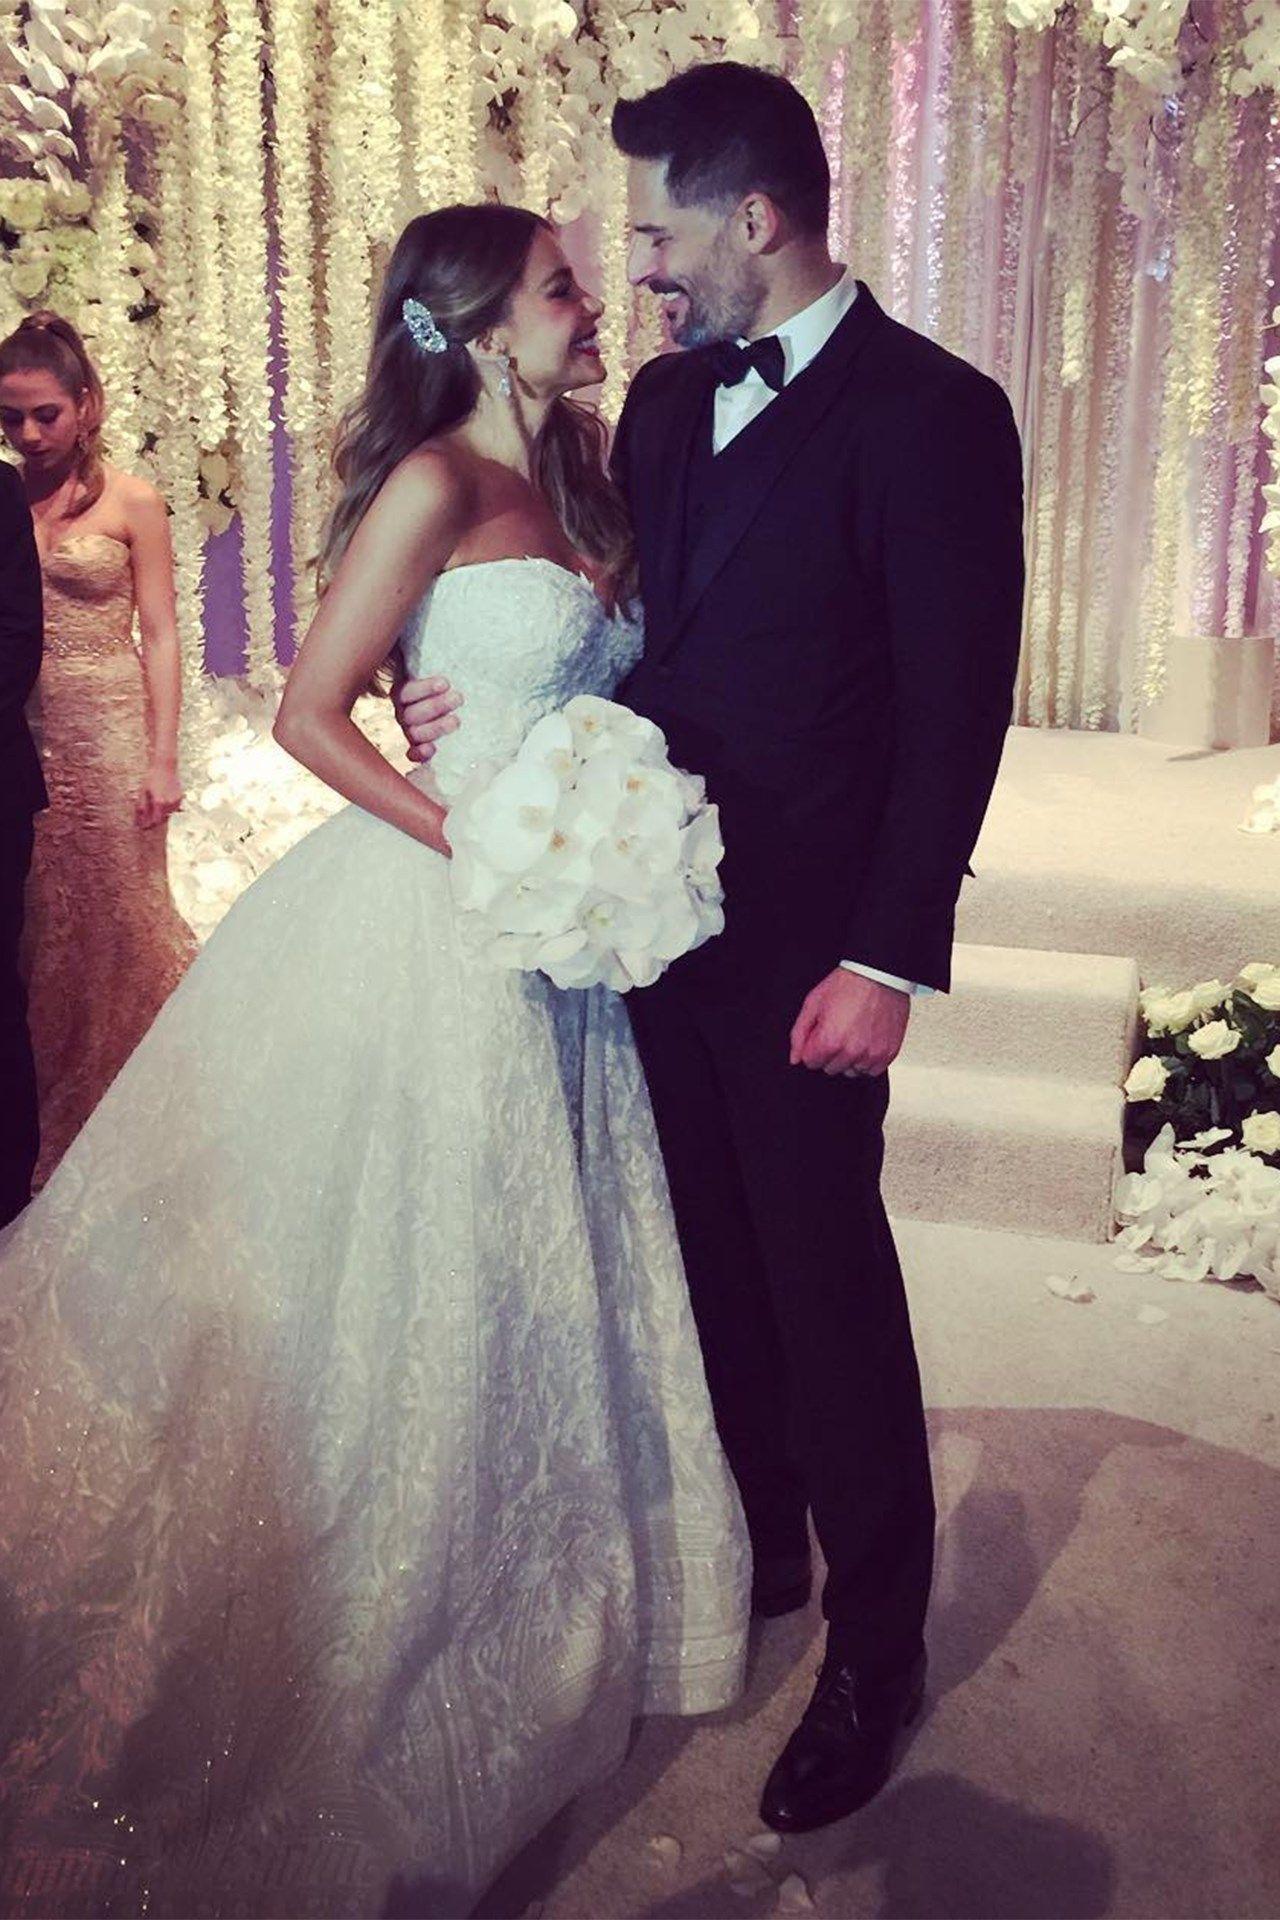 Bellas wedding dress  Inside Sofia Vergaraus Miami Wedding  starz  Pinterest  Mujeres